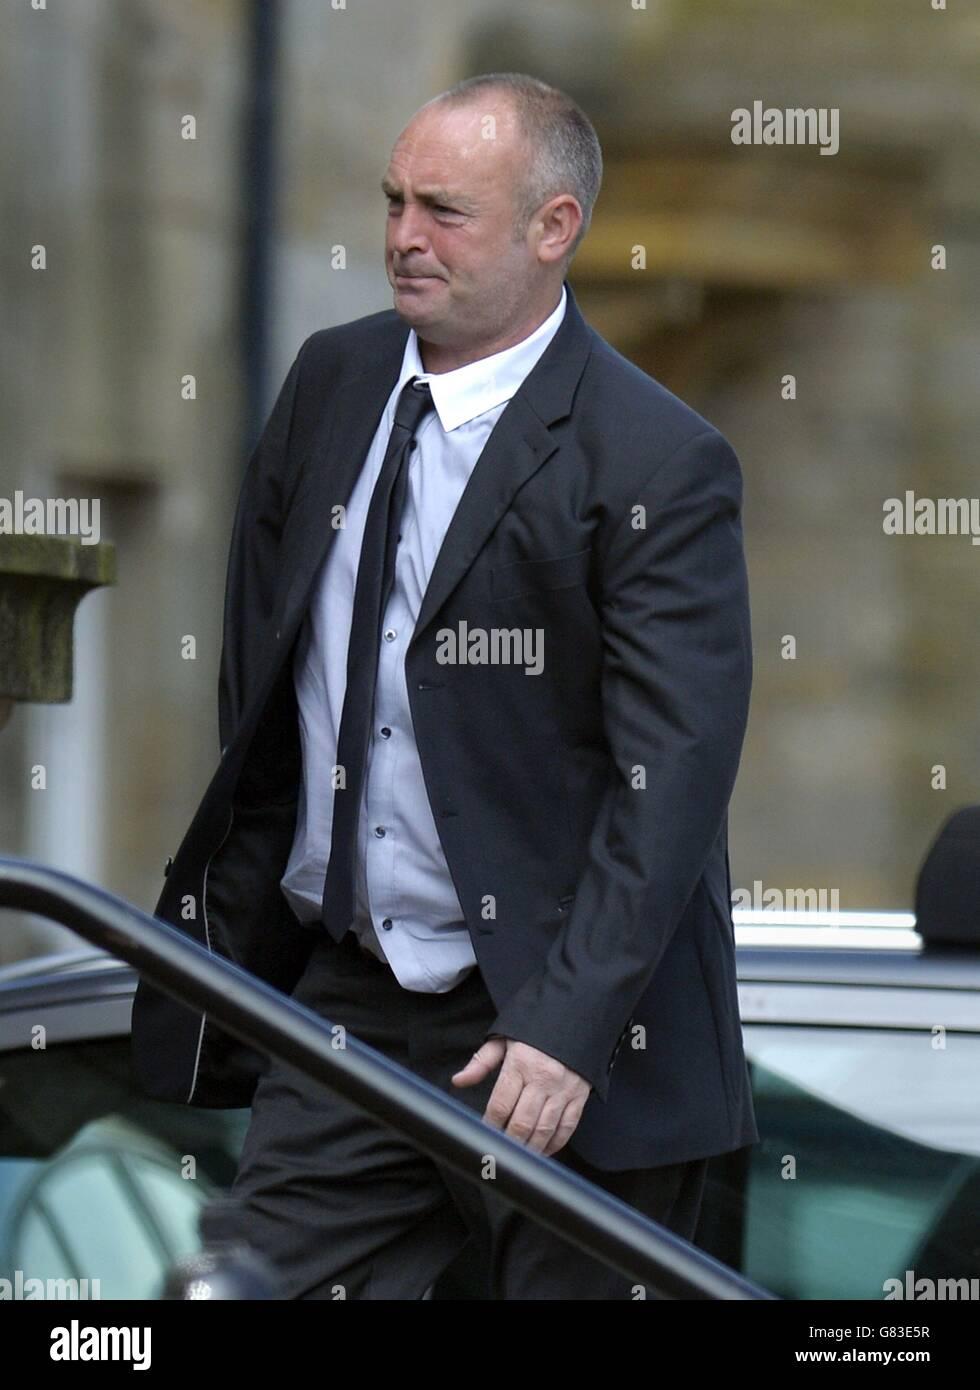 Stephen Potts court case - Stock Image